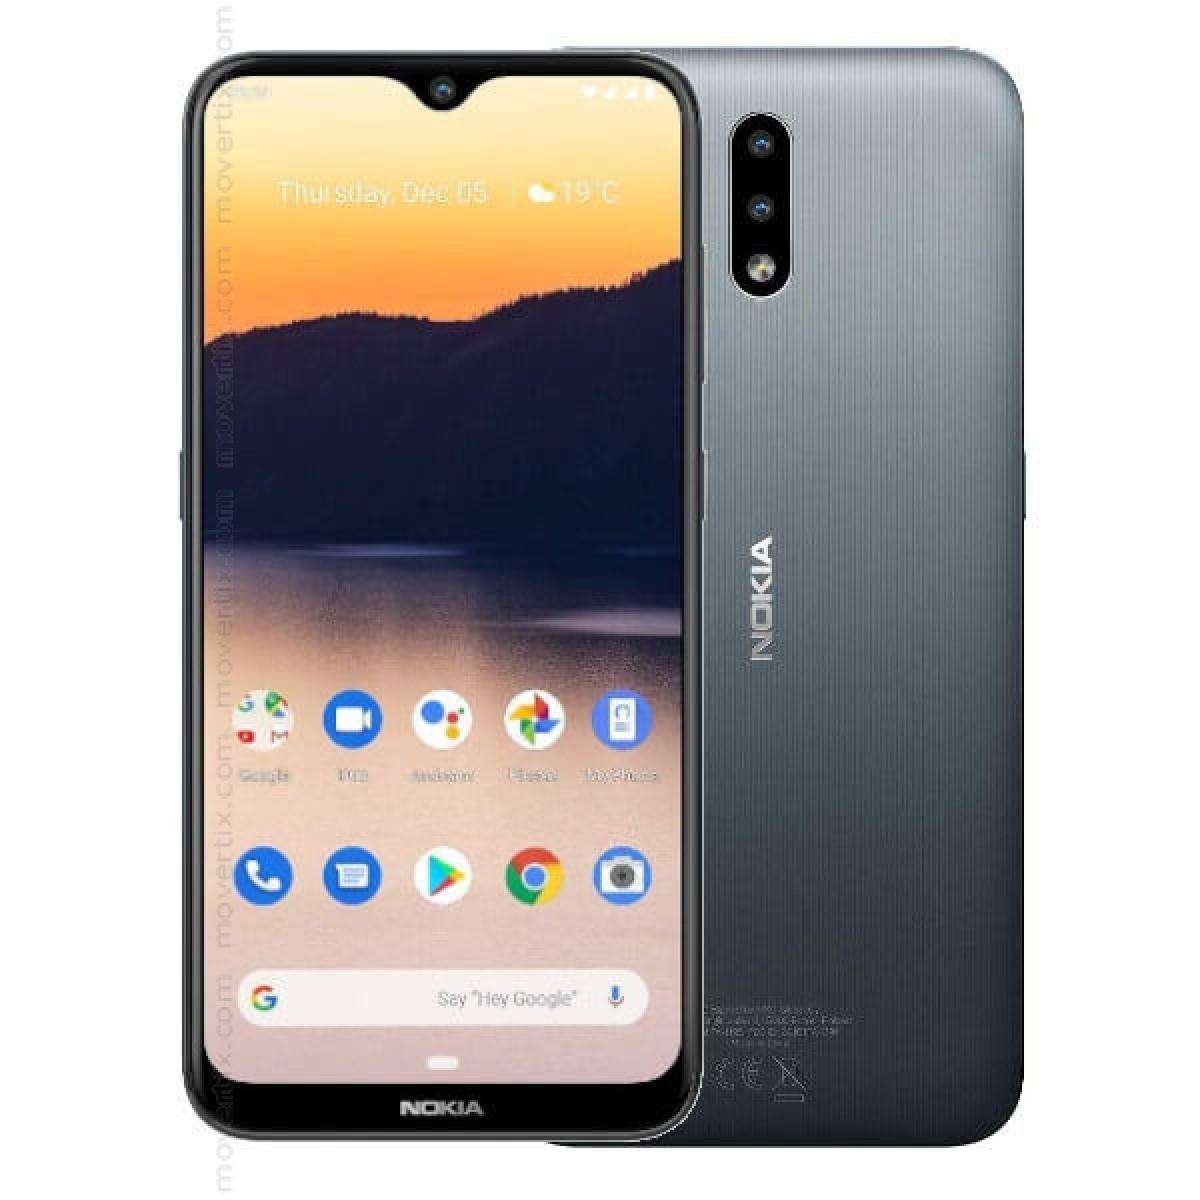 Nokia 2 3 Dual Sim Charcoal 32gb And 2gb Ram 6438409042545 Movertix Mobile Phones Shop